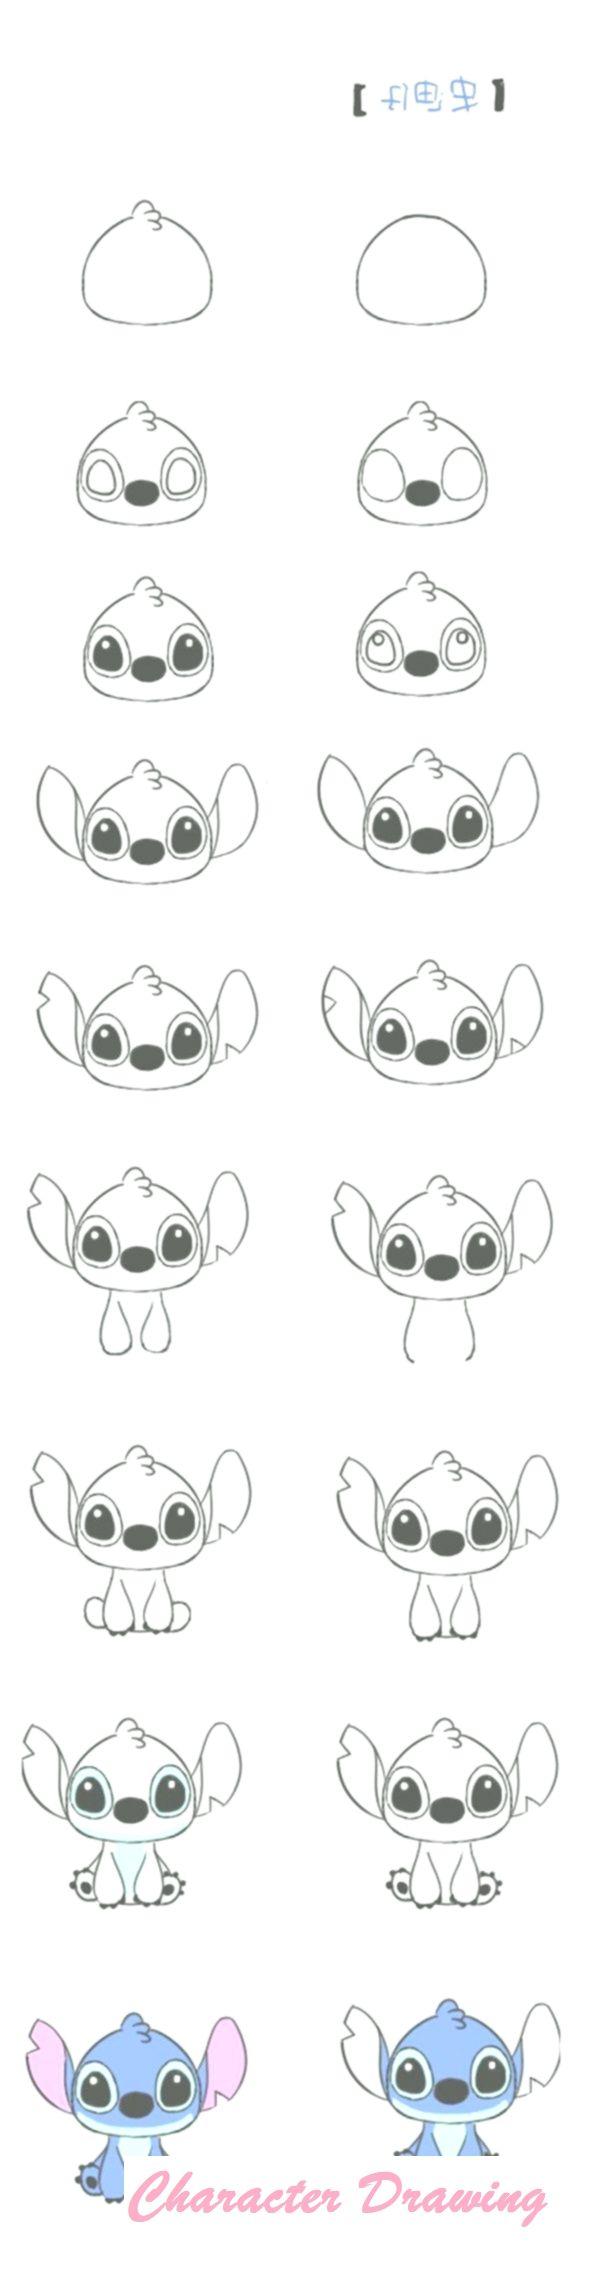 How To Draw Cartoon Characters Step By Step 30 Examples Art Drawings Simple Cute Drawings Disney Drawings